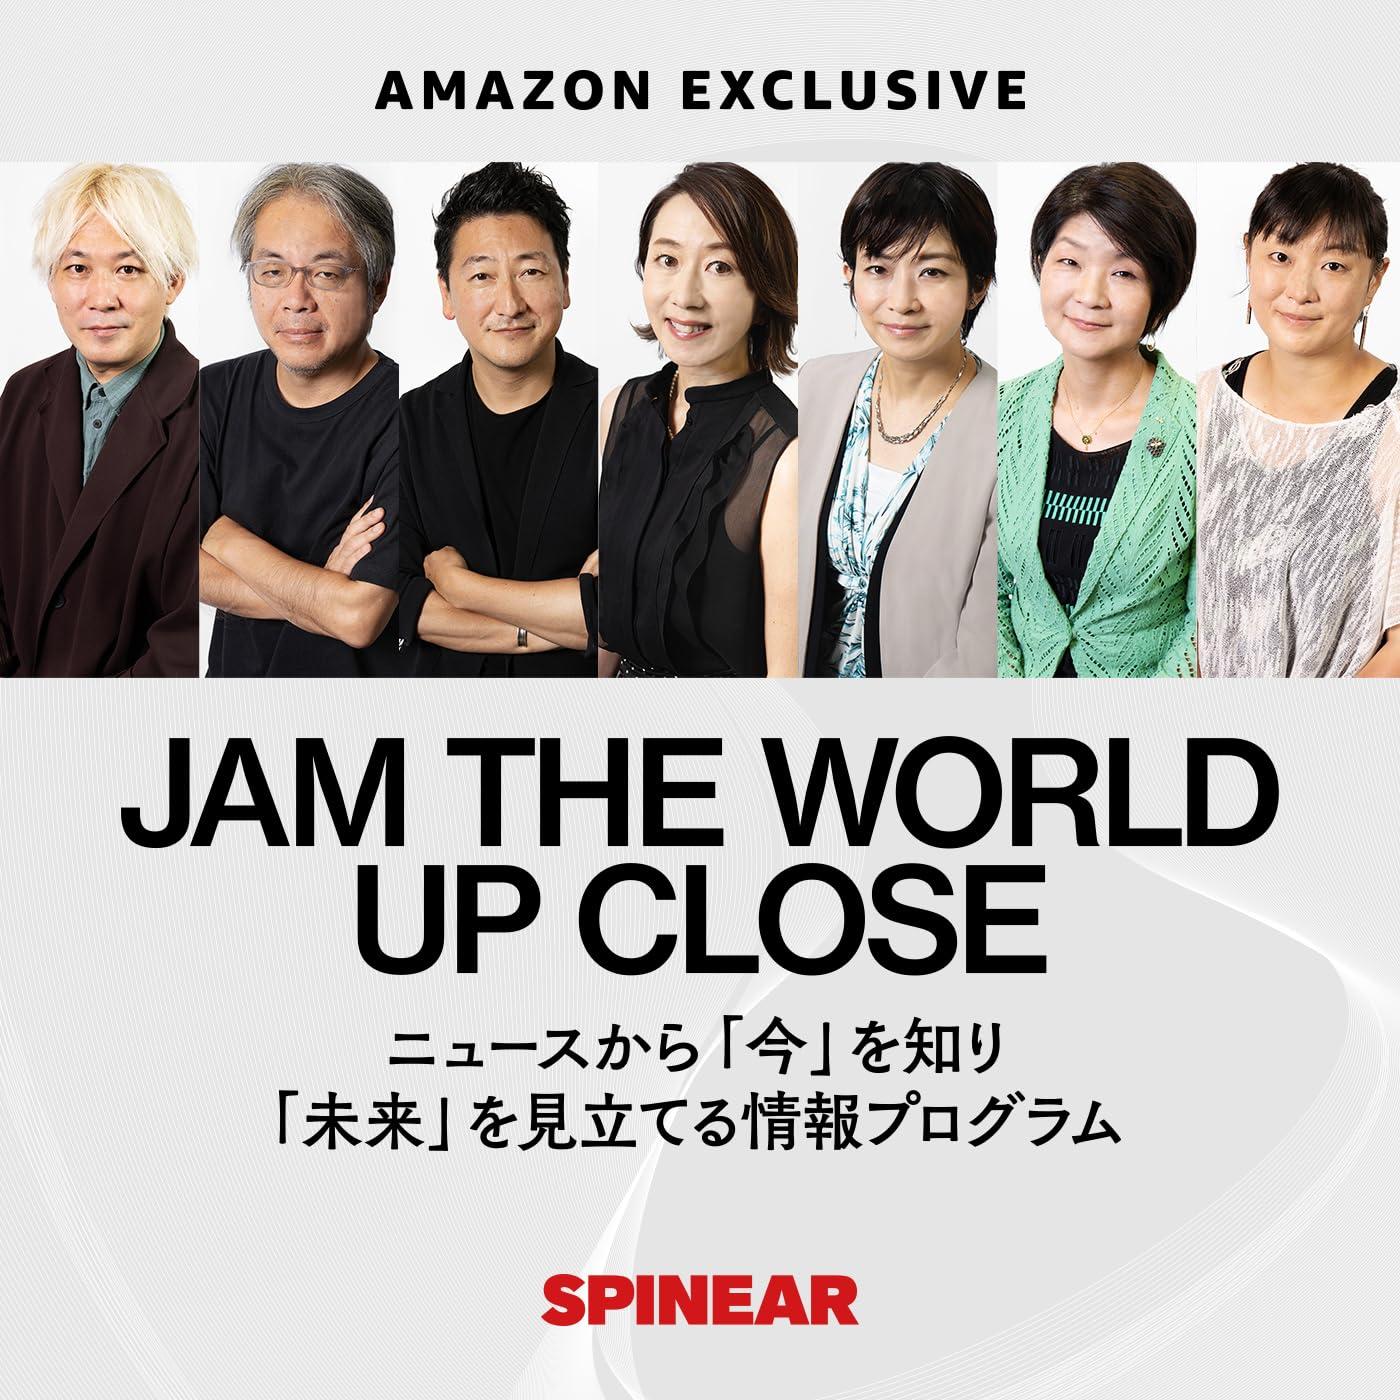 JAM THE WORLD - UP CLOSE